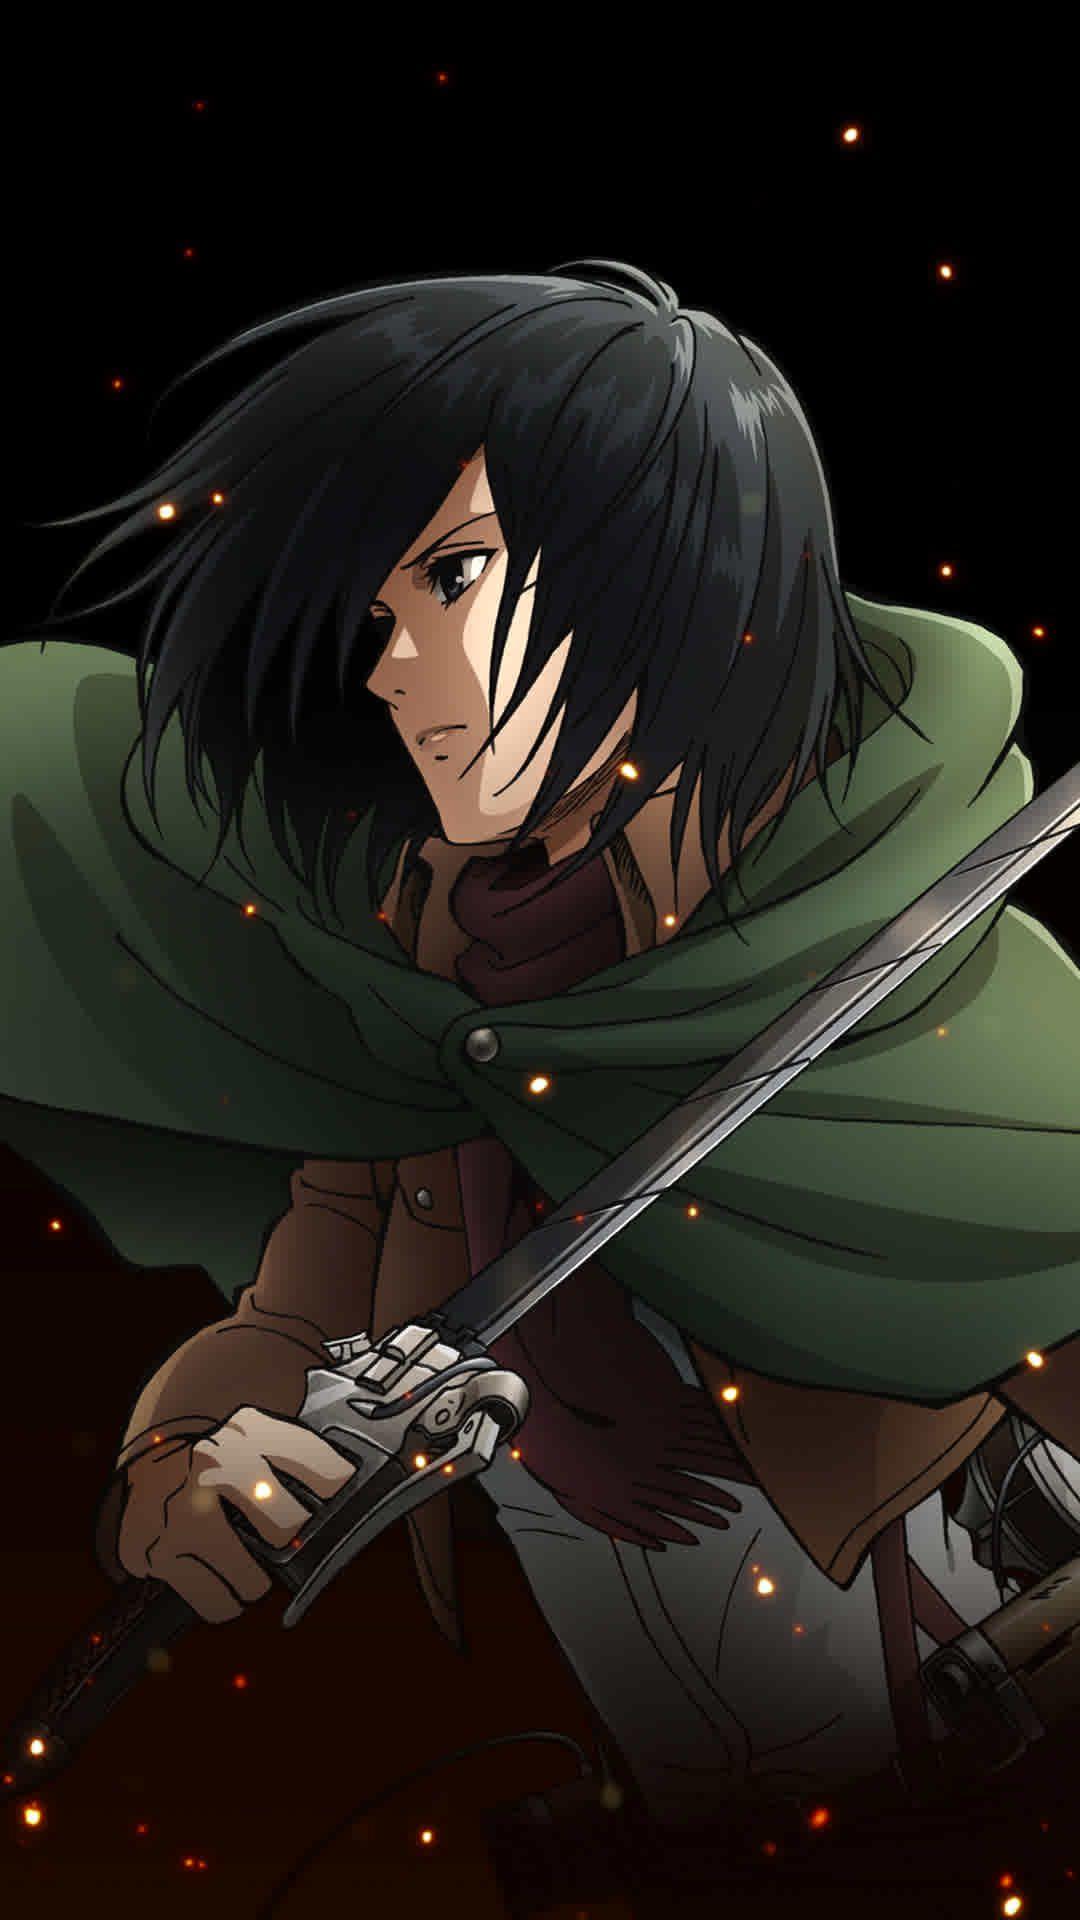 Mikasa Ackerman Mikasa Is Bomb And I Love Her Attack On Titan Anime Attack On Titan Fanart Attack On Titan